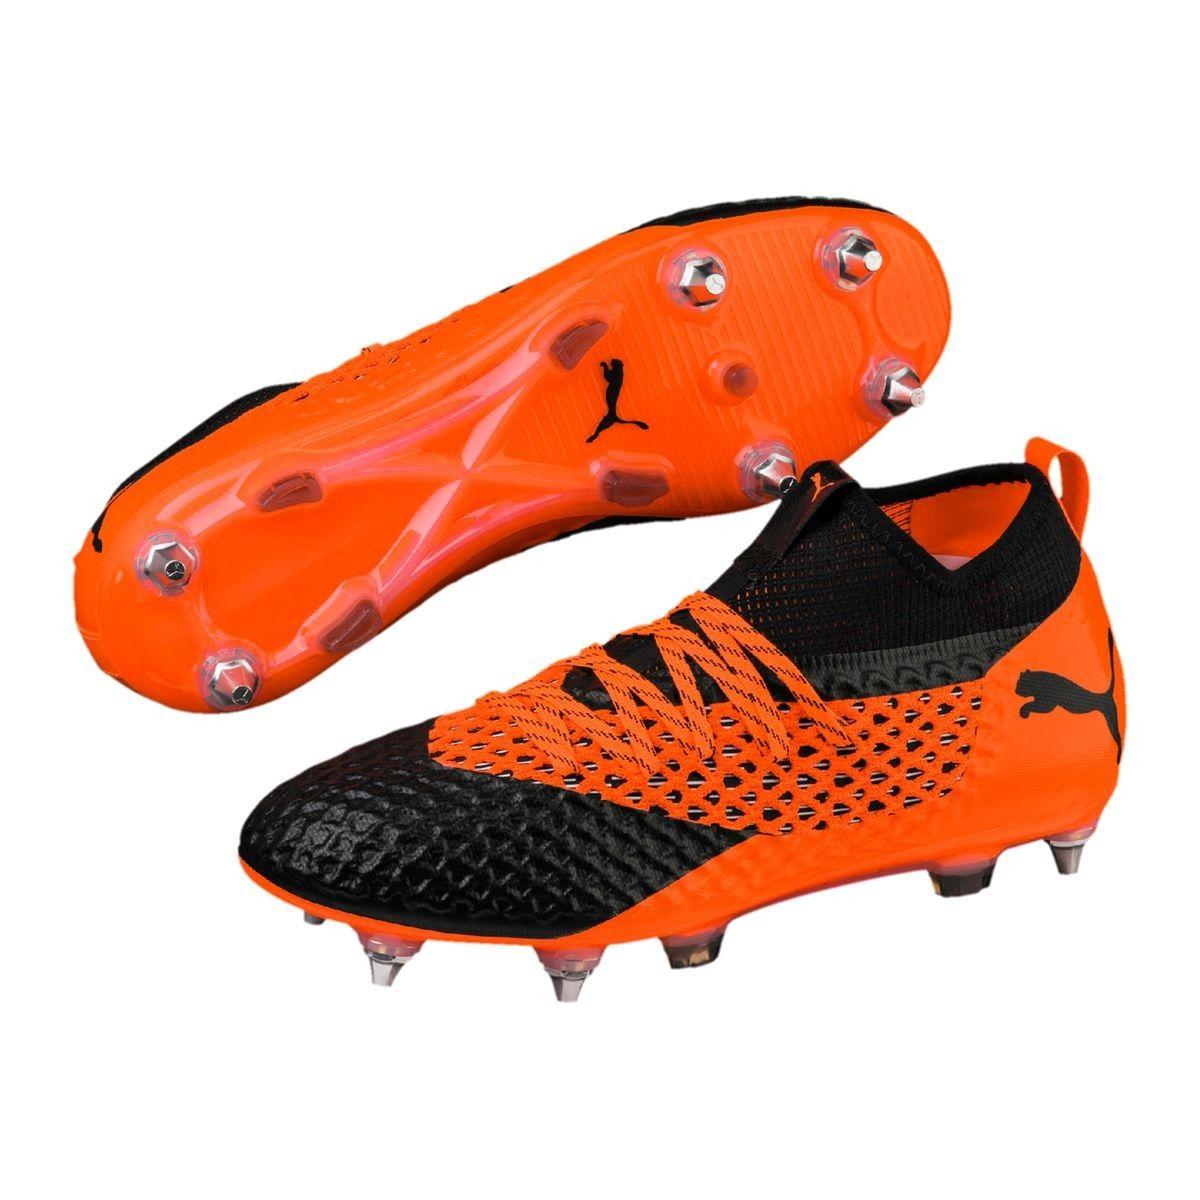 chaussures de football puma